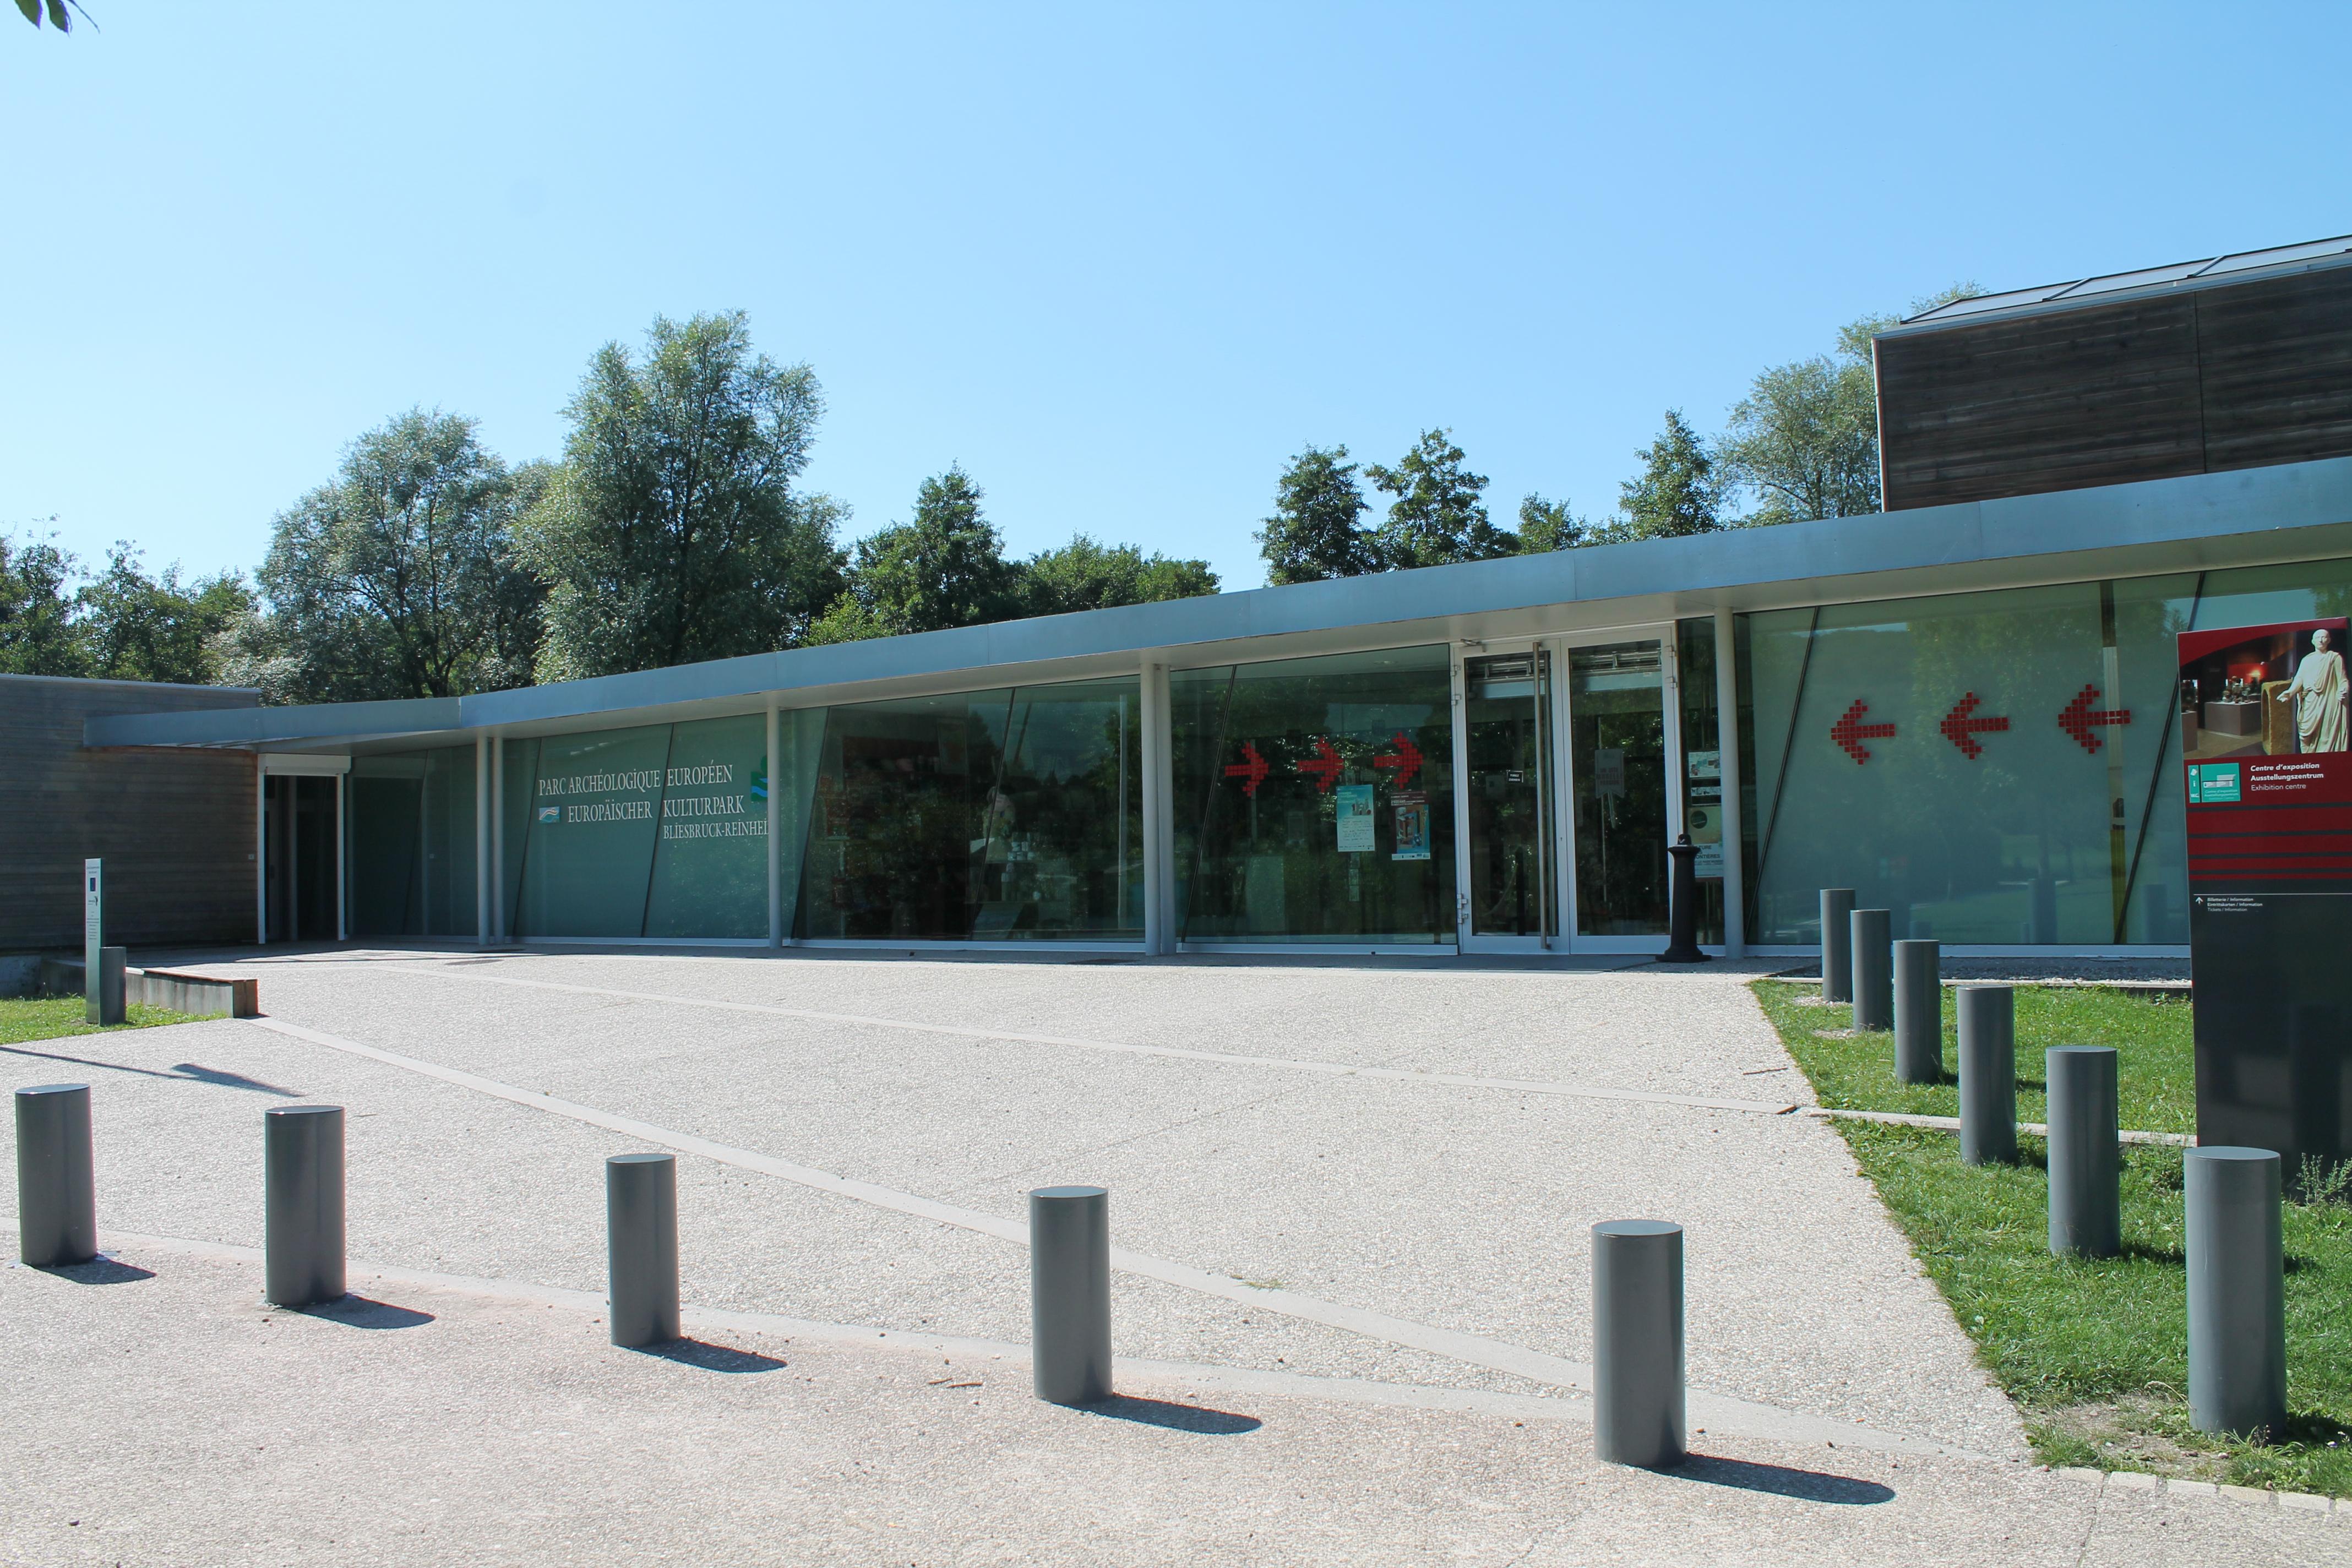 Ausstellungszentrum, Centre d'Éxposition